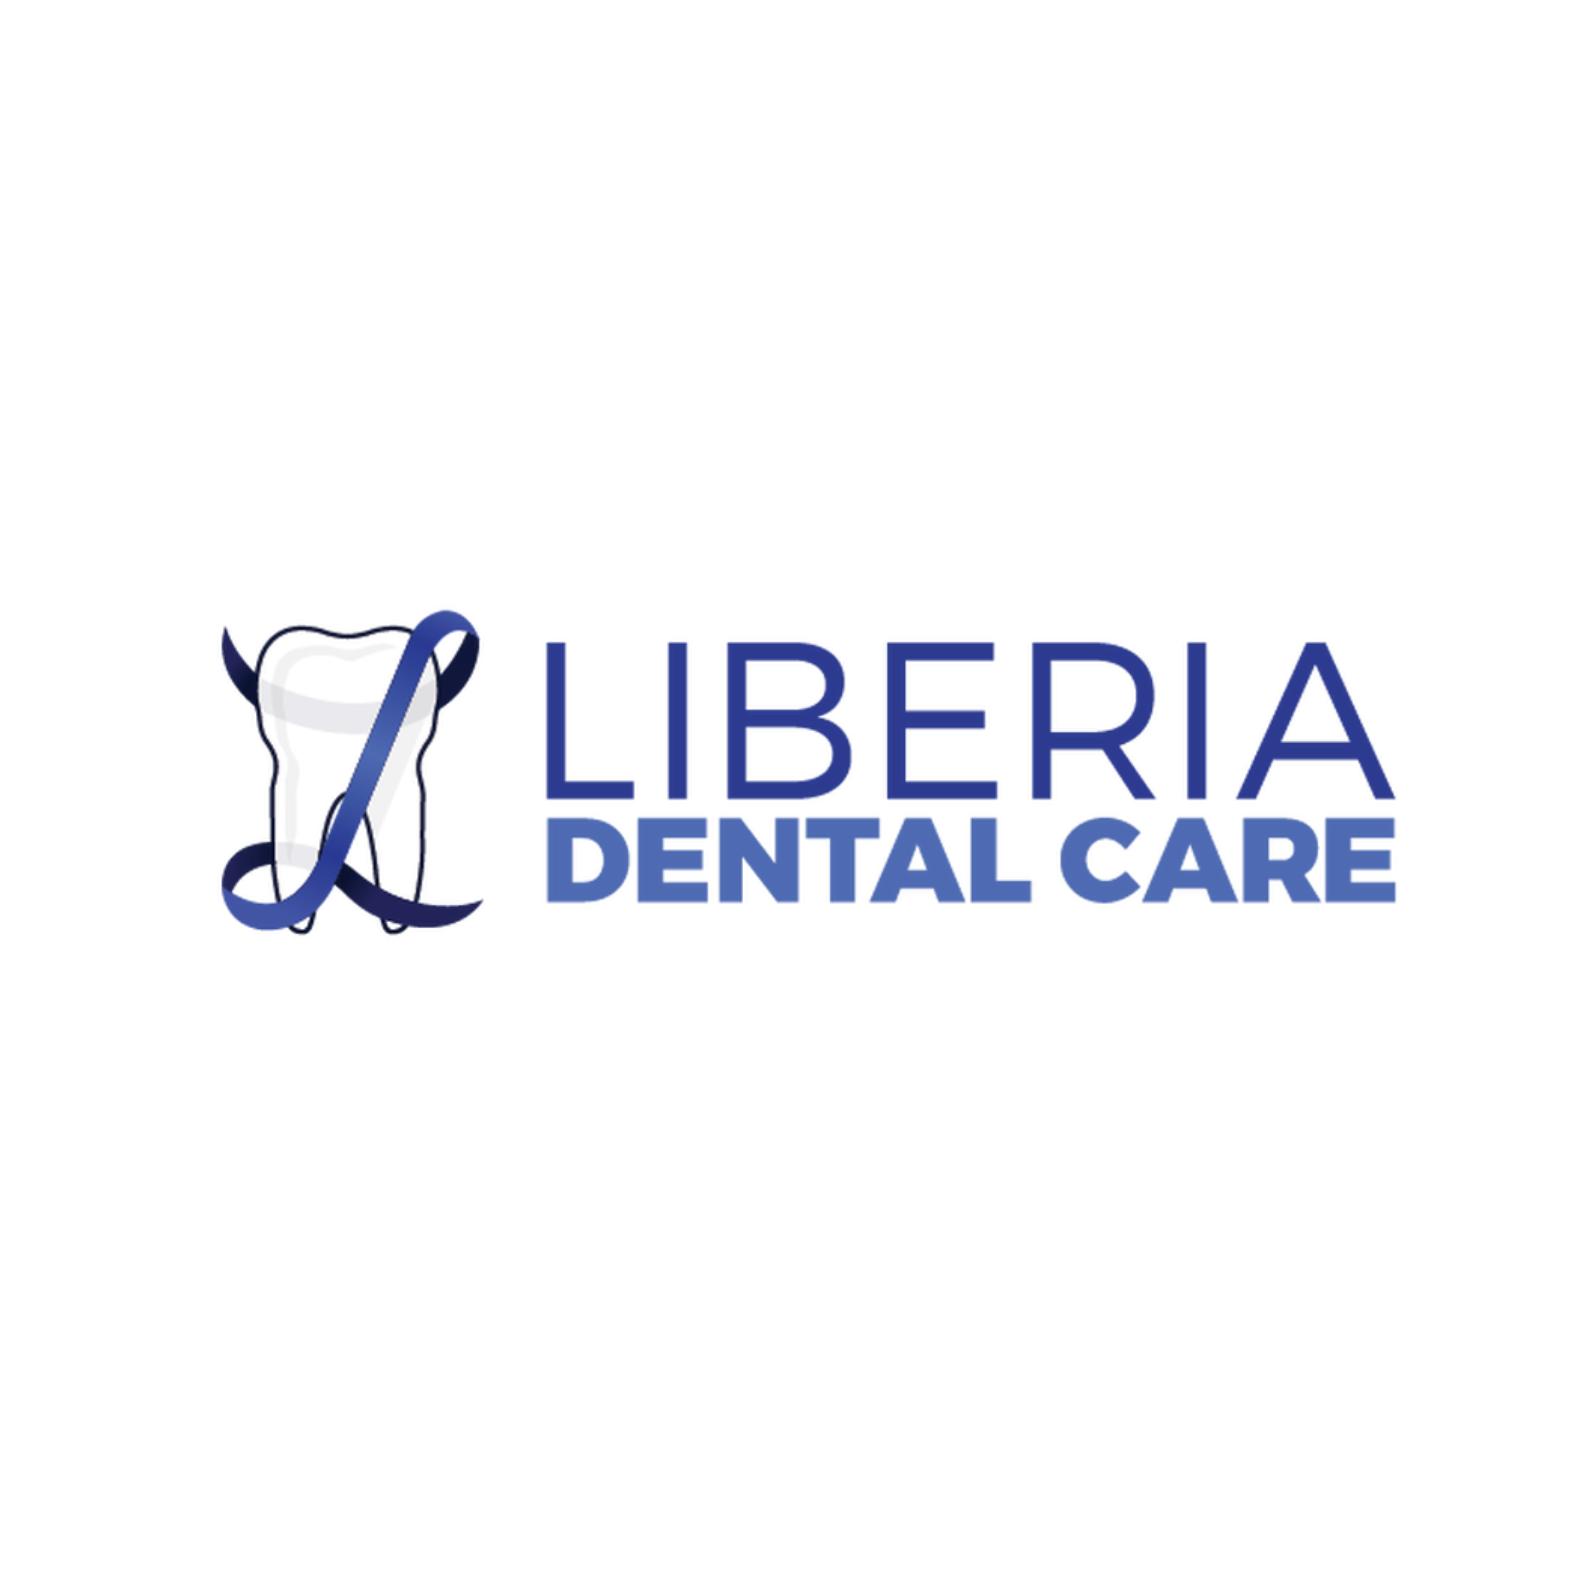 Liberia Dental Care